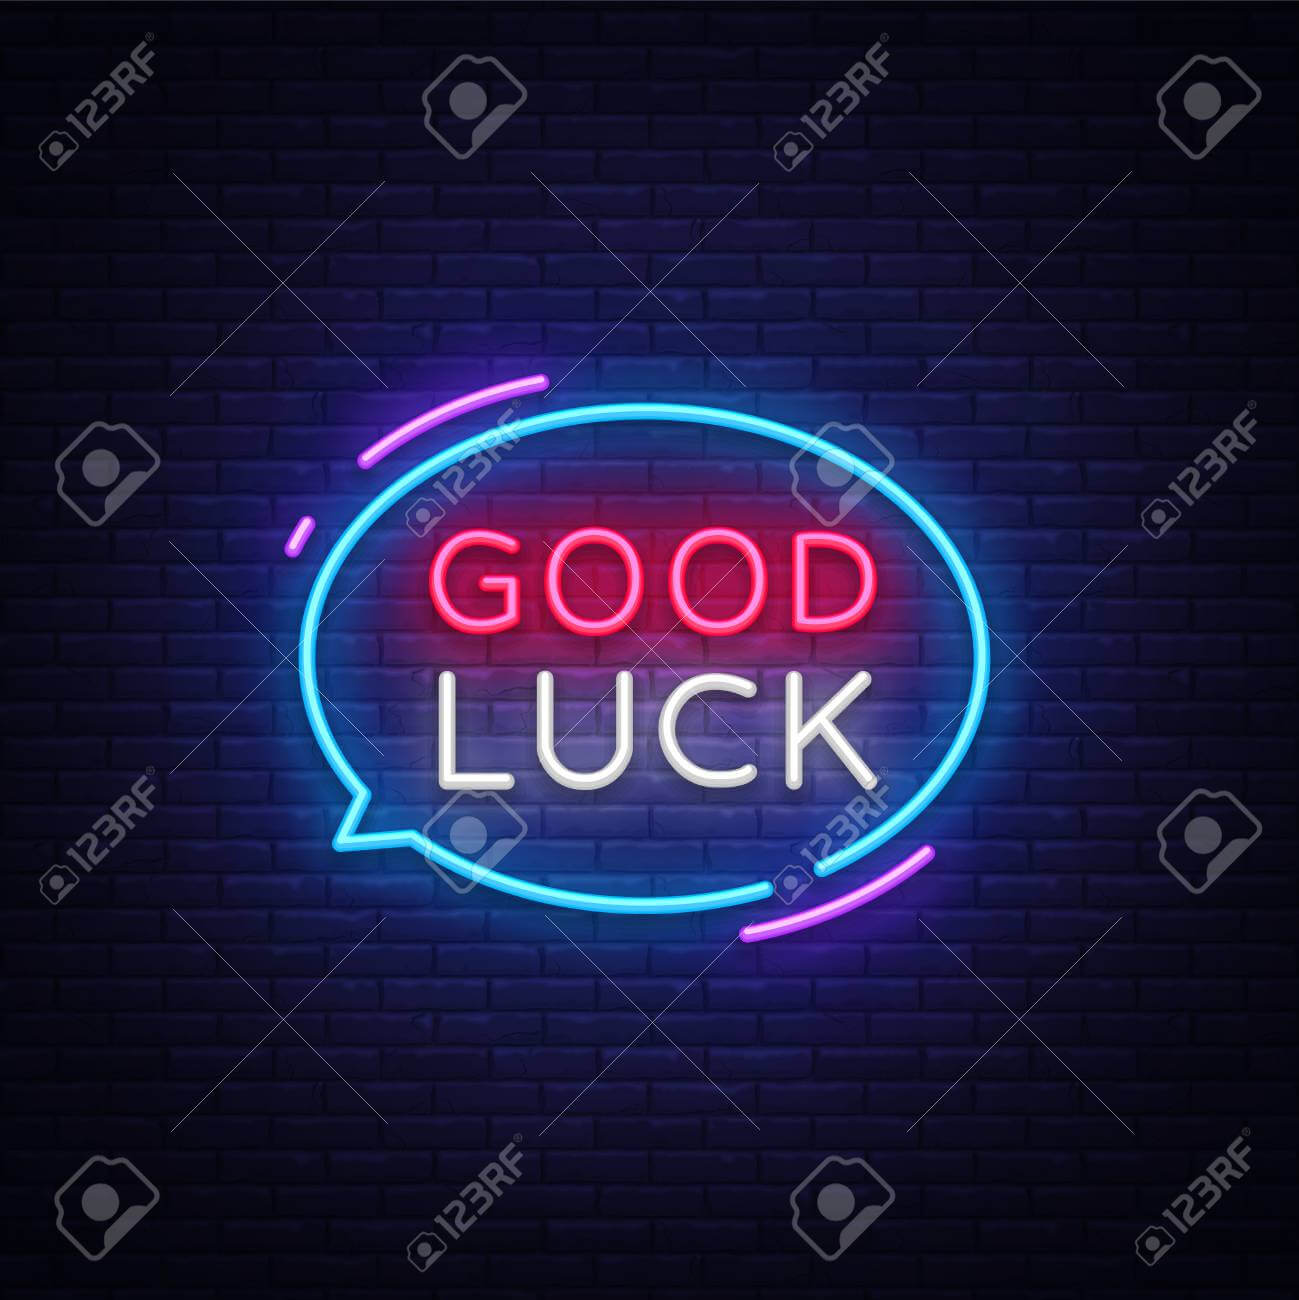 Good Luck Neon Text Vector. Good Luck Neon Sign, Design Template,.. Pertaining To Good Luck Banner Template